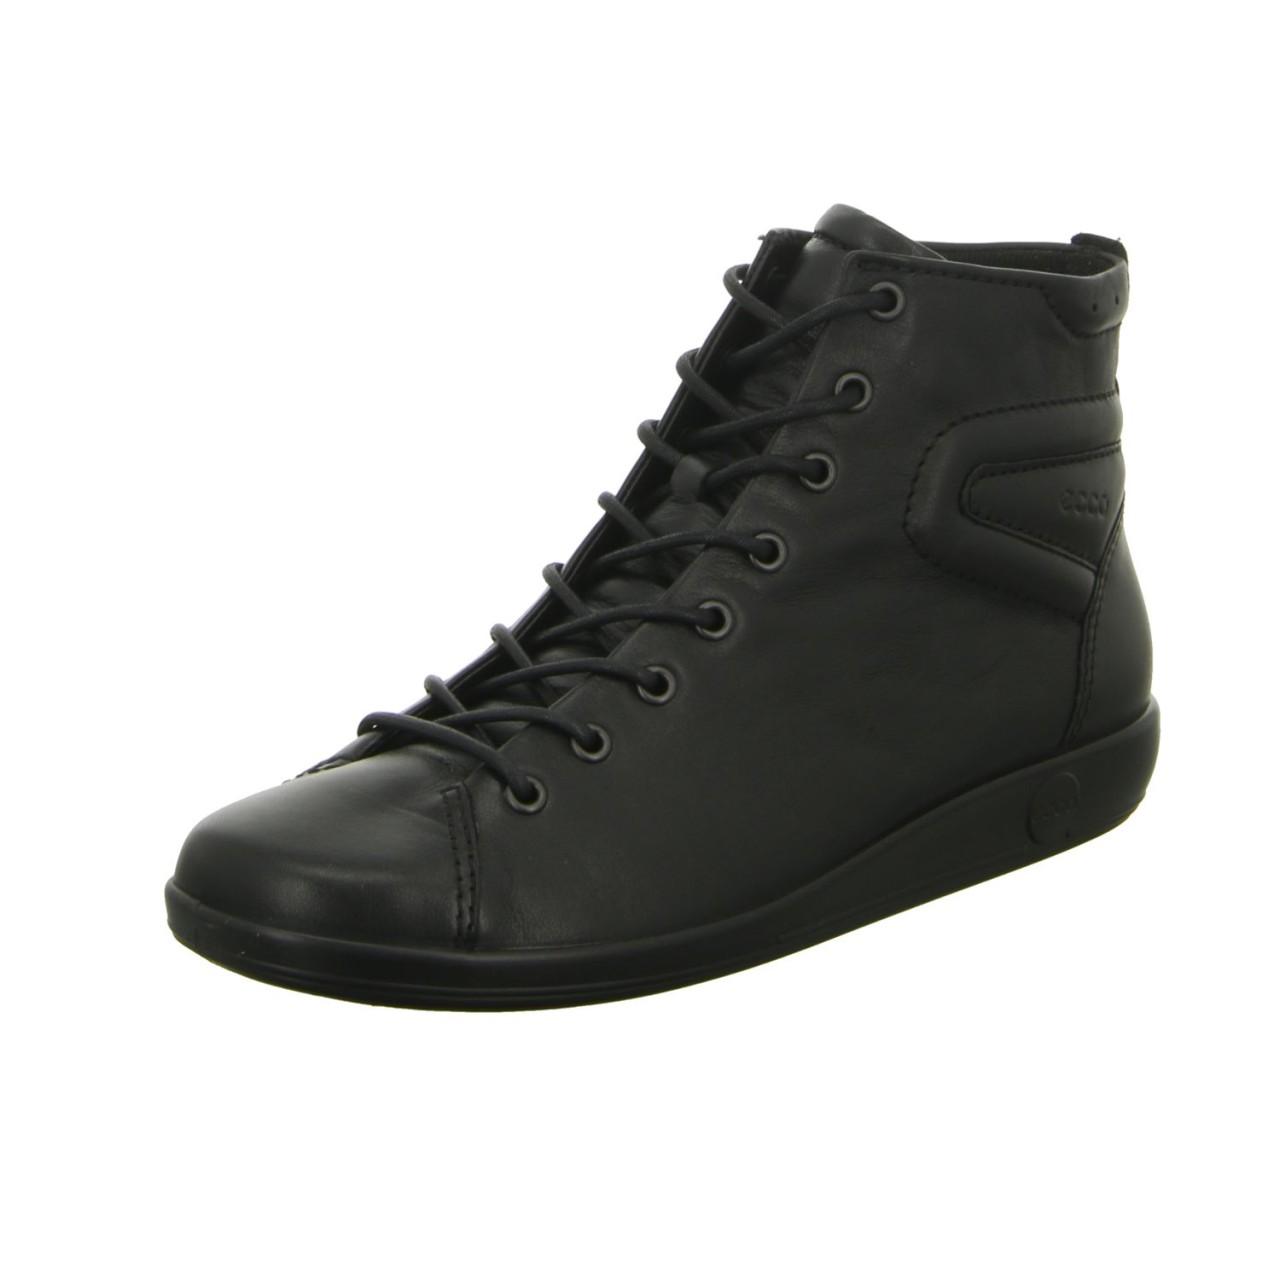 Ecco Sneaker & Schn眉rer schwarz schwarz